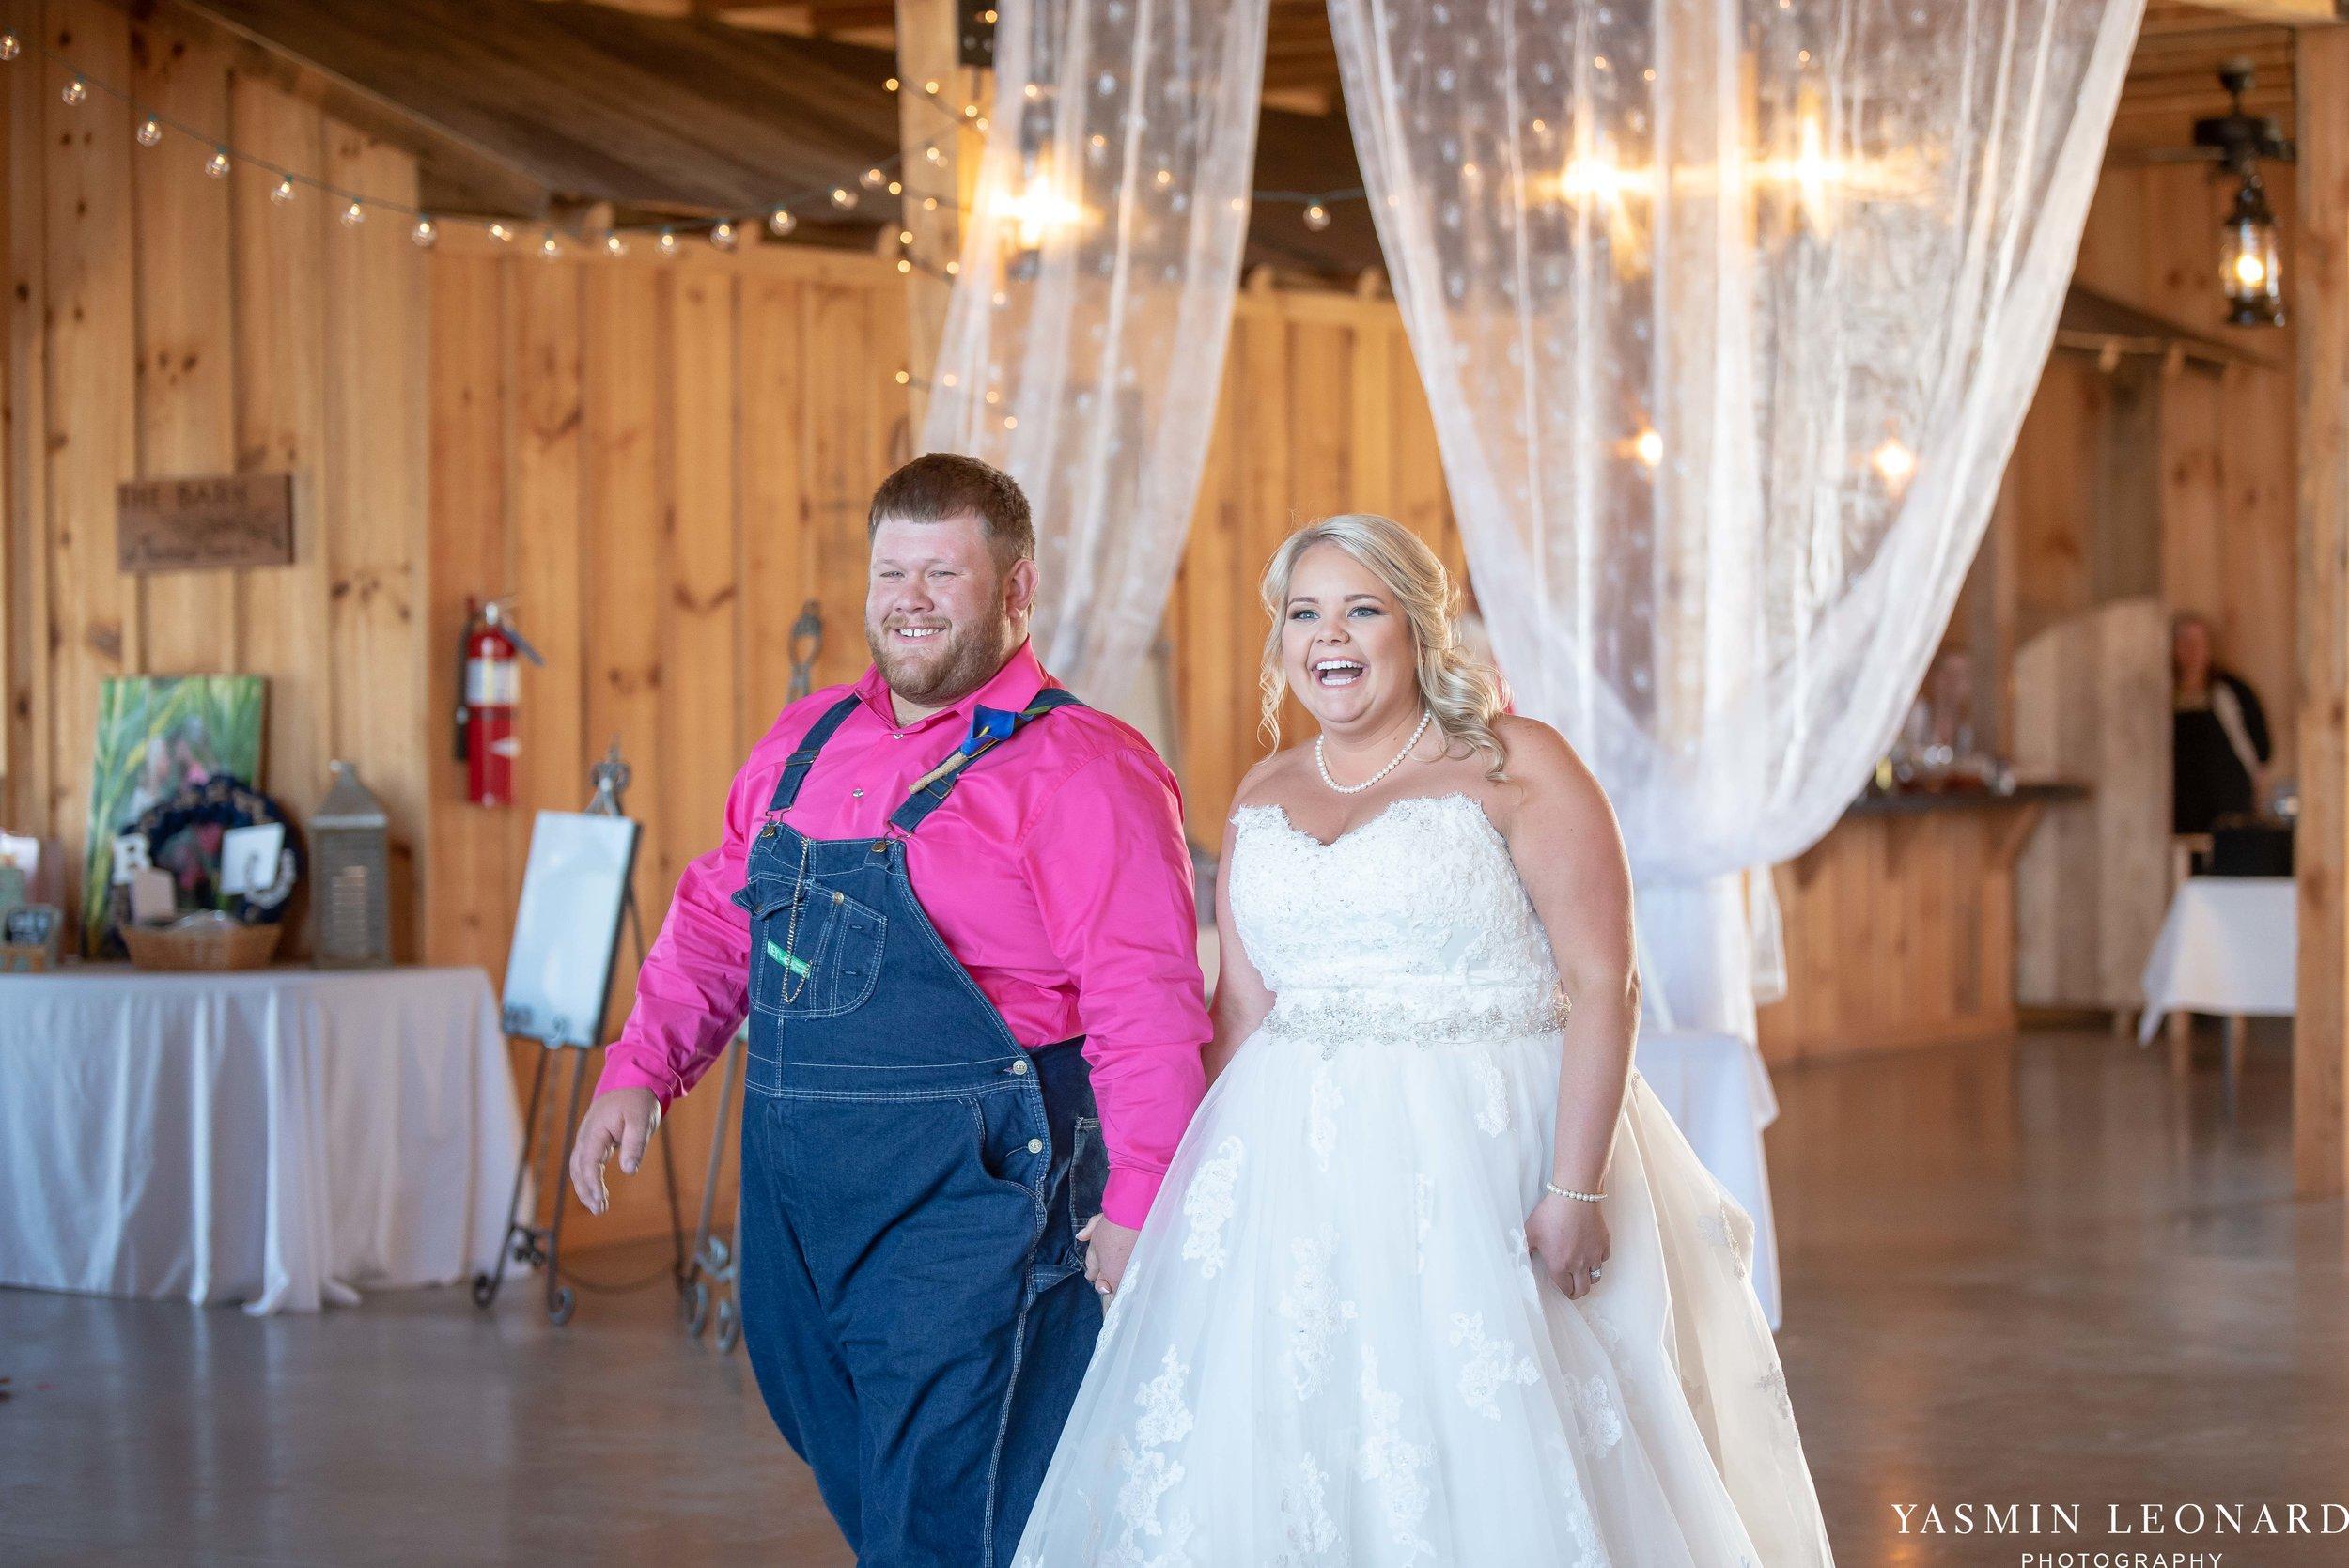 The Barn at Heritage Farm - Country Wedding - Pink and Blue Wedding - Barn Wedding - Outdoor Wedding - Cotton and Wheat Decor - Groom in Bibs - Pink Bridal Colors - Yasmin Leonard Photography-24.jpg